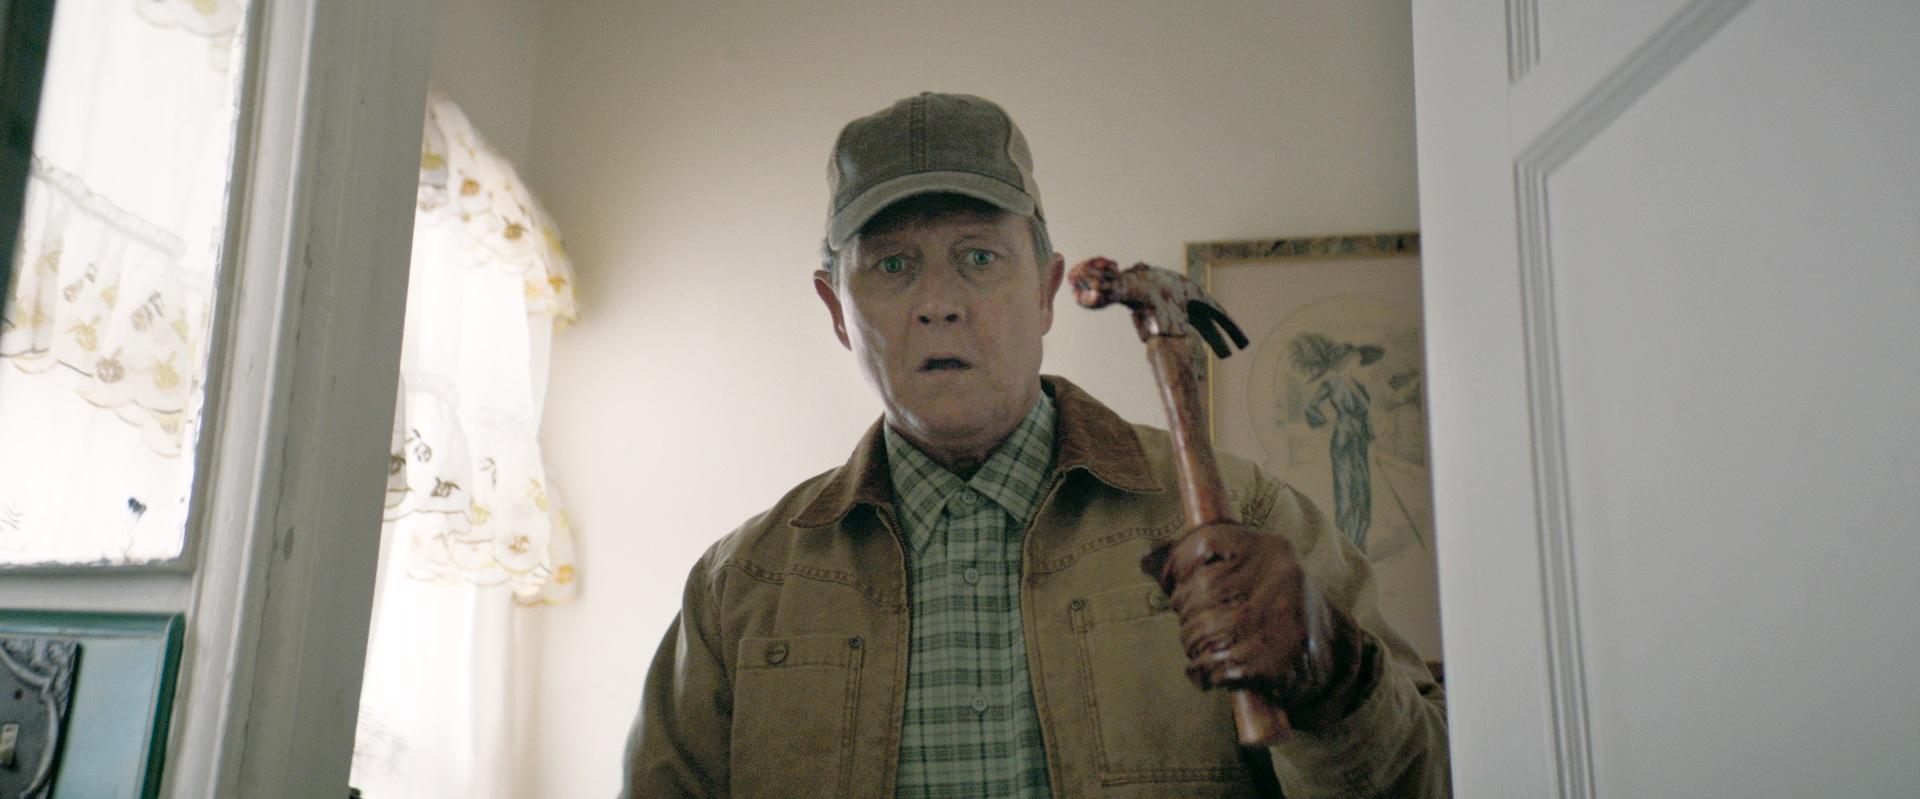 Robert Patrick  as Harvey in the horror / thriller   TONE-DEAF  . Photo courtesy of  Saban Films .